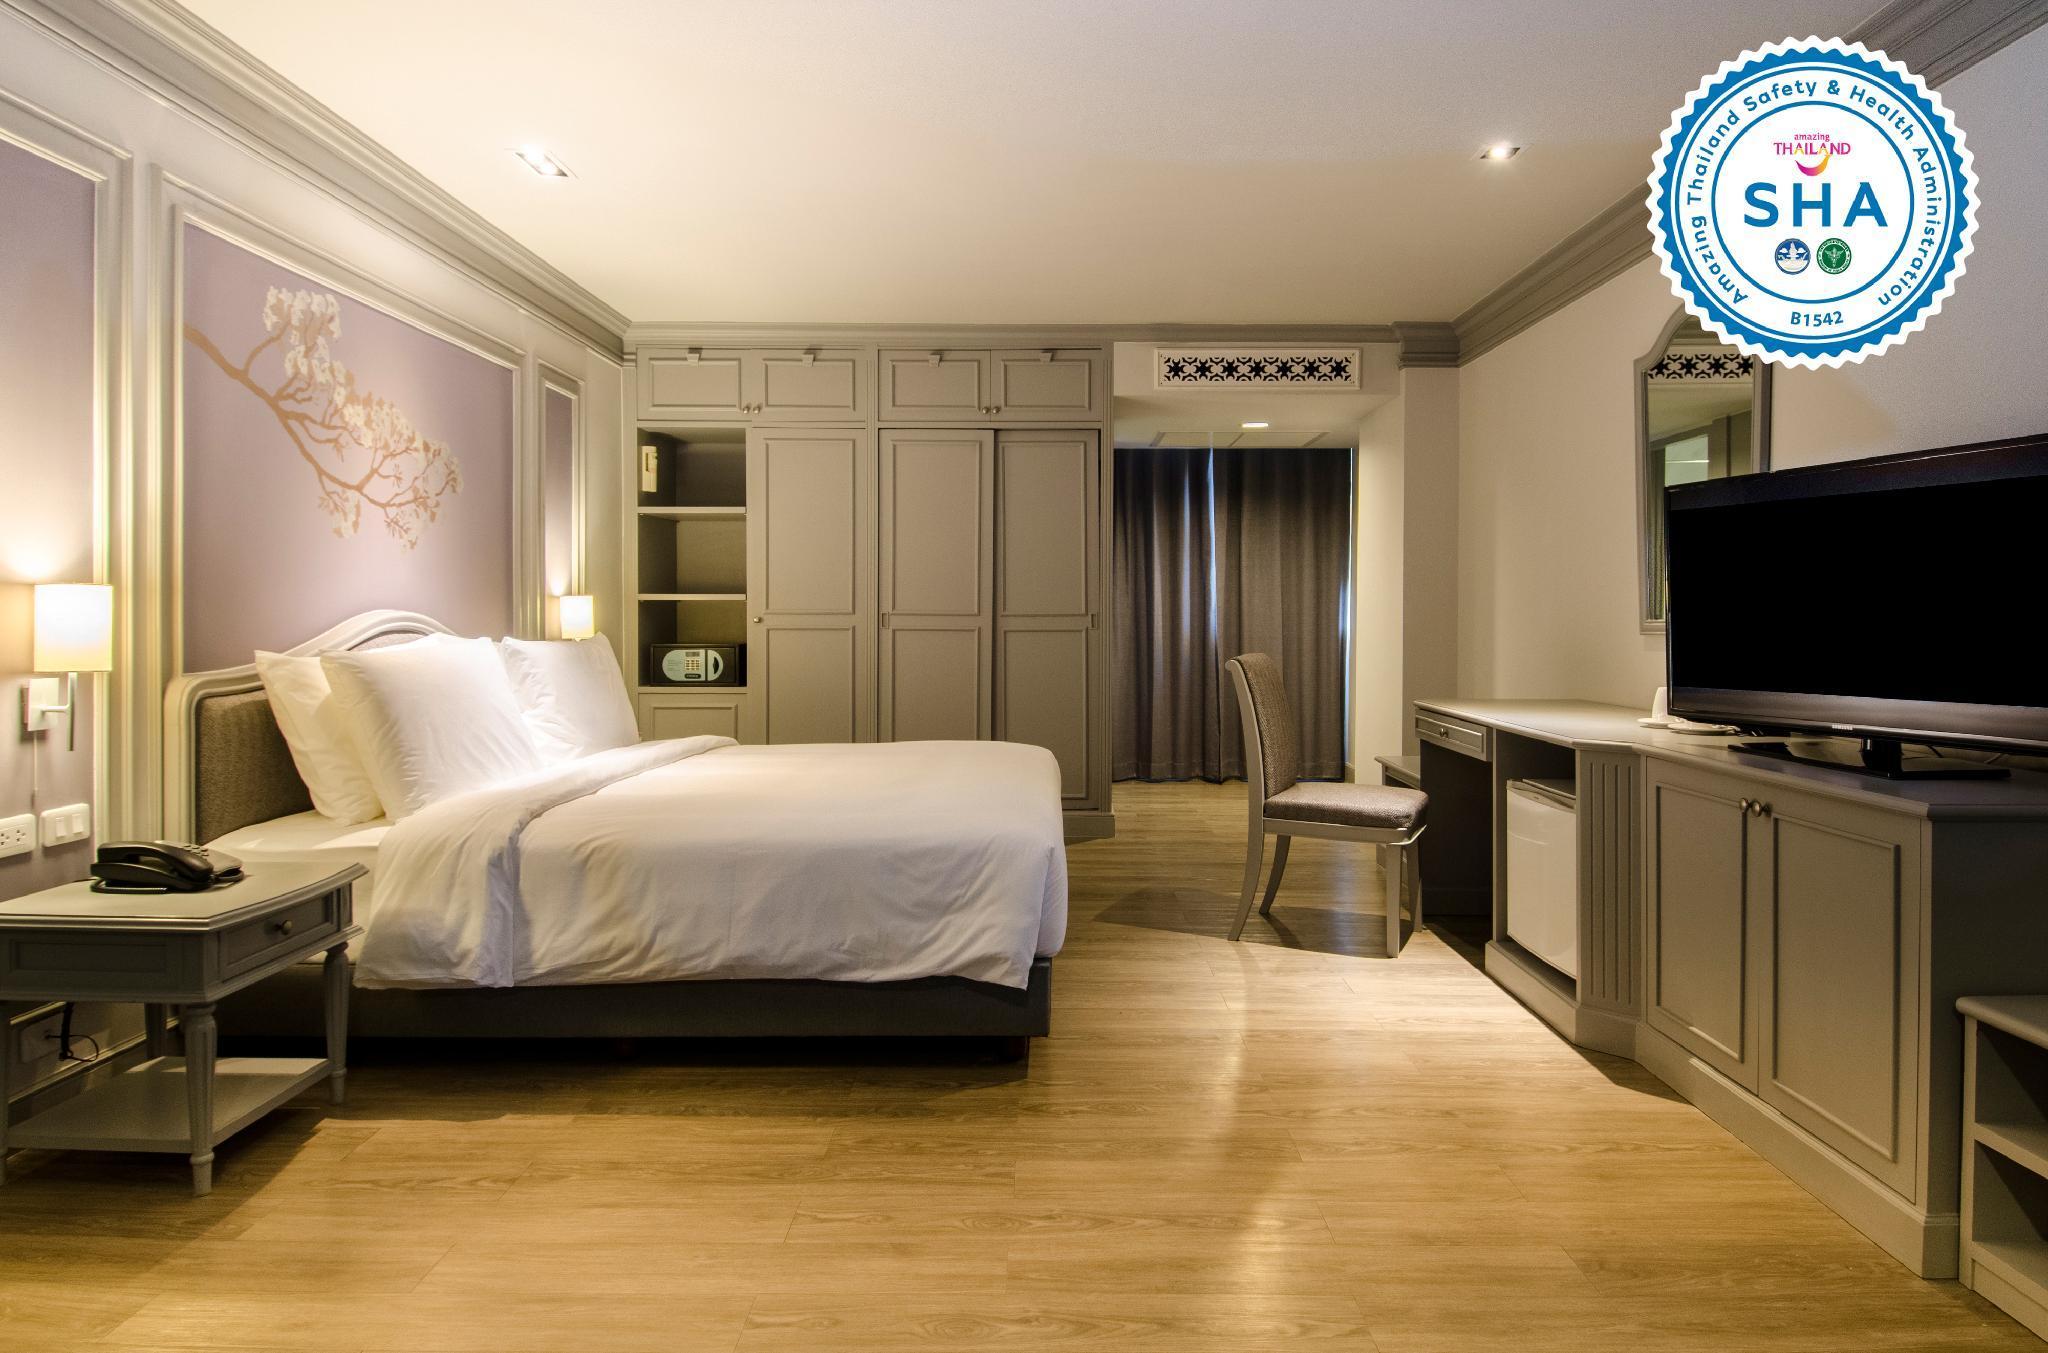 The Pantip Hotel Ladprao (SHA Certified)